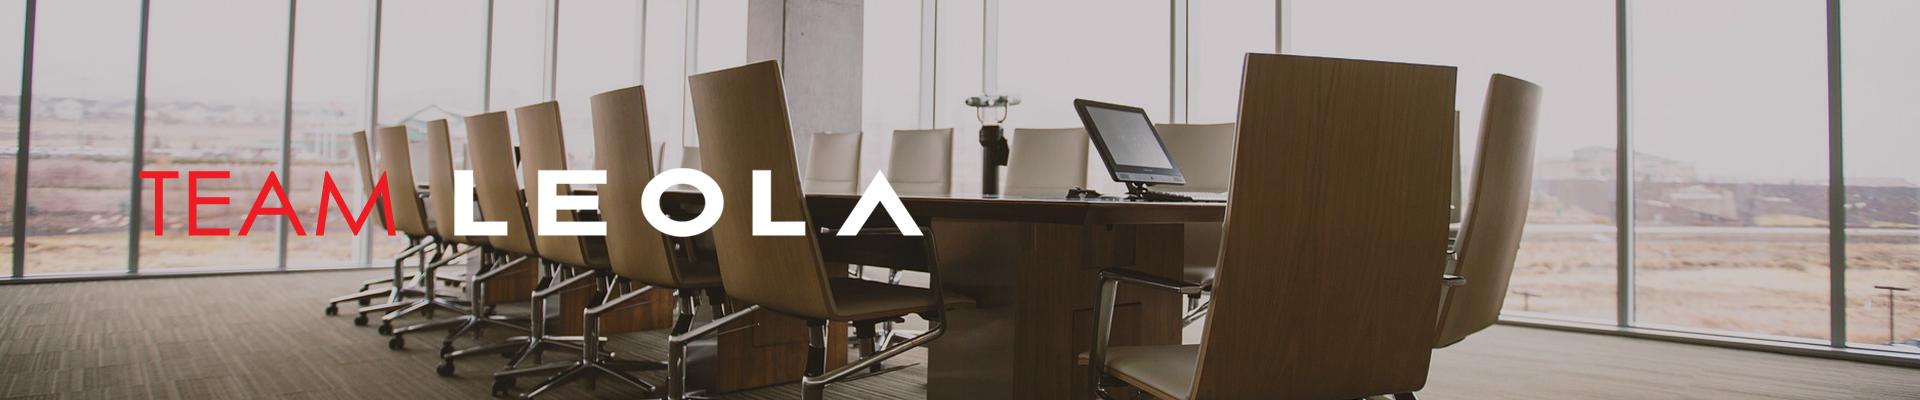 Team - LEOLA Commercial Inc